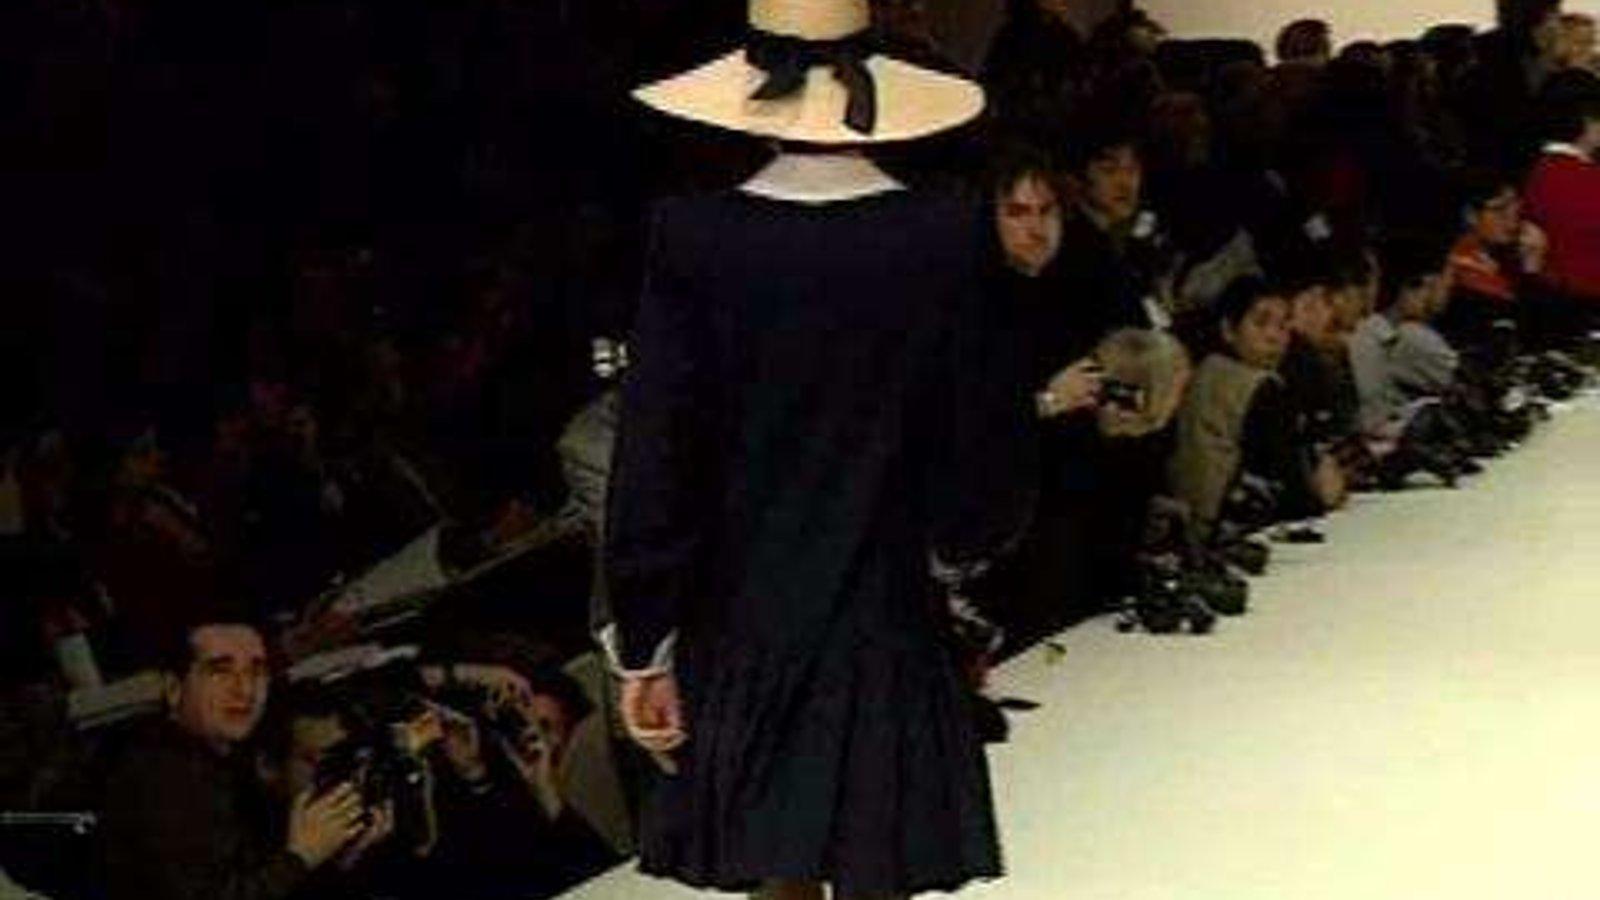 Givenchy Part 1 (Hubert)